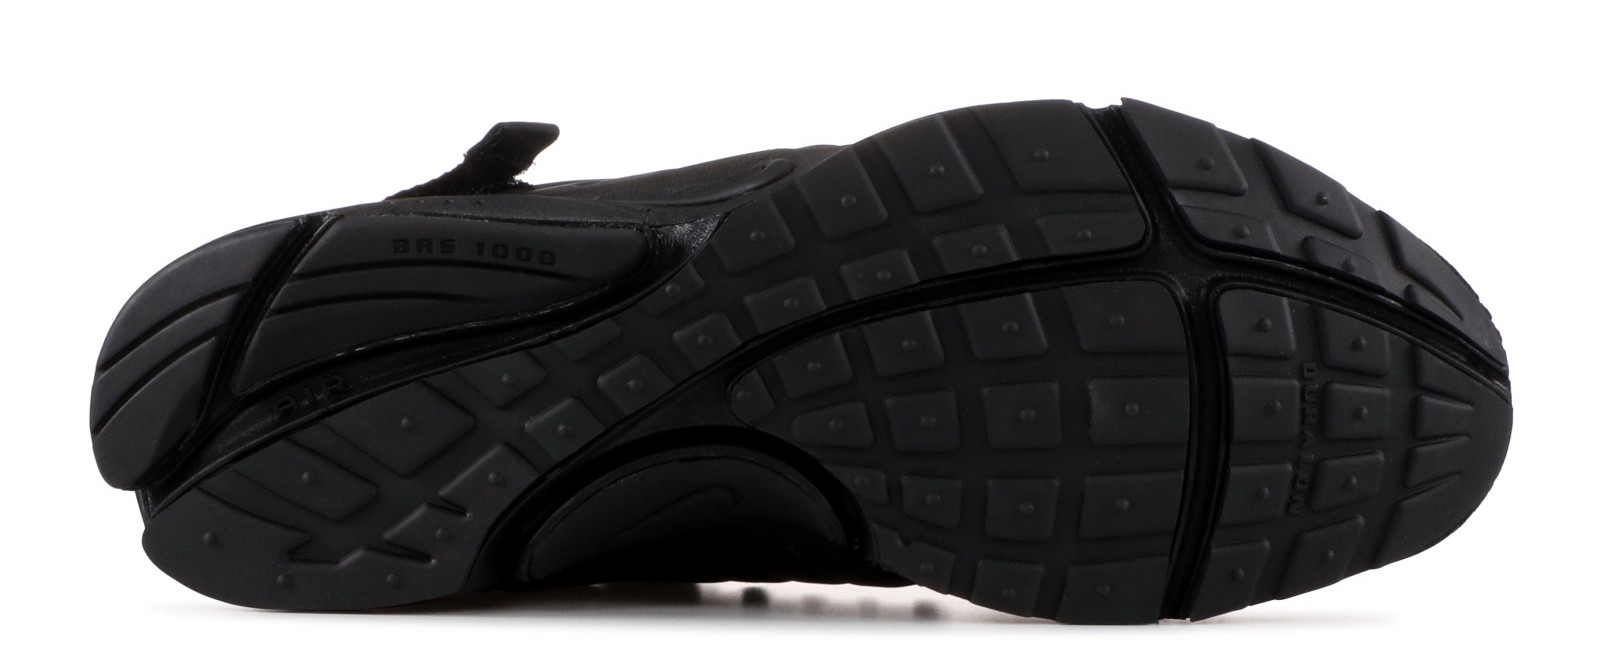 Nike x Off-White Presto Black 7